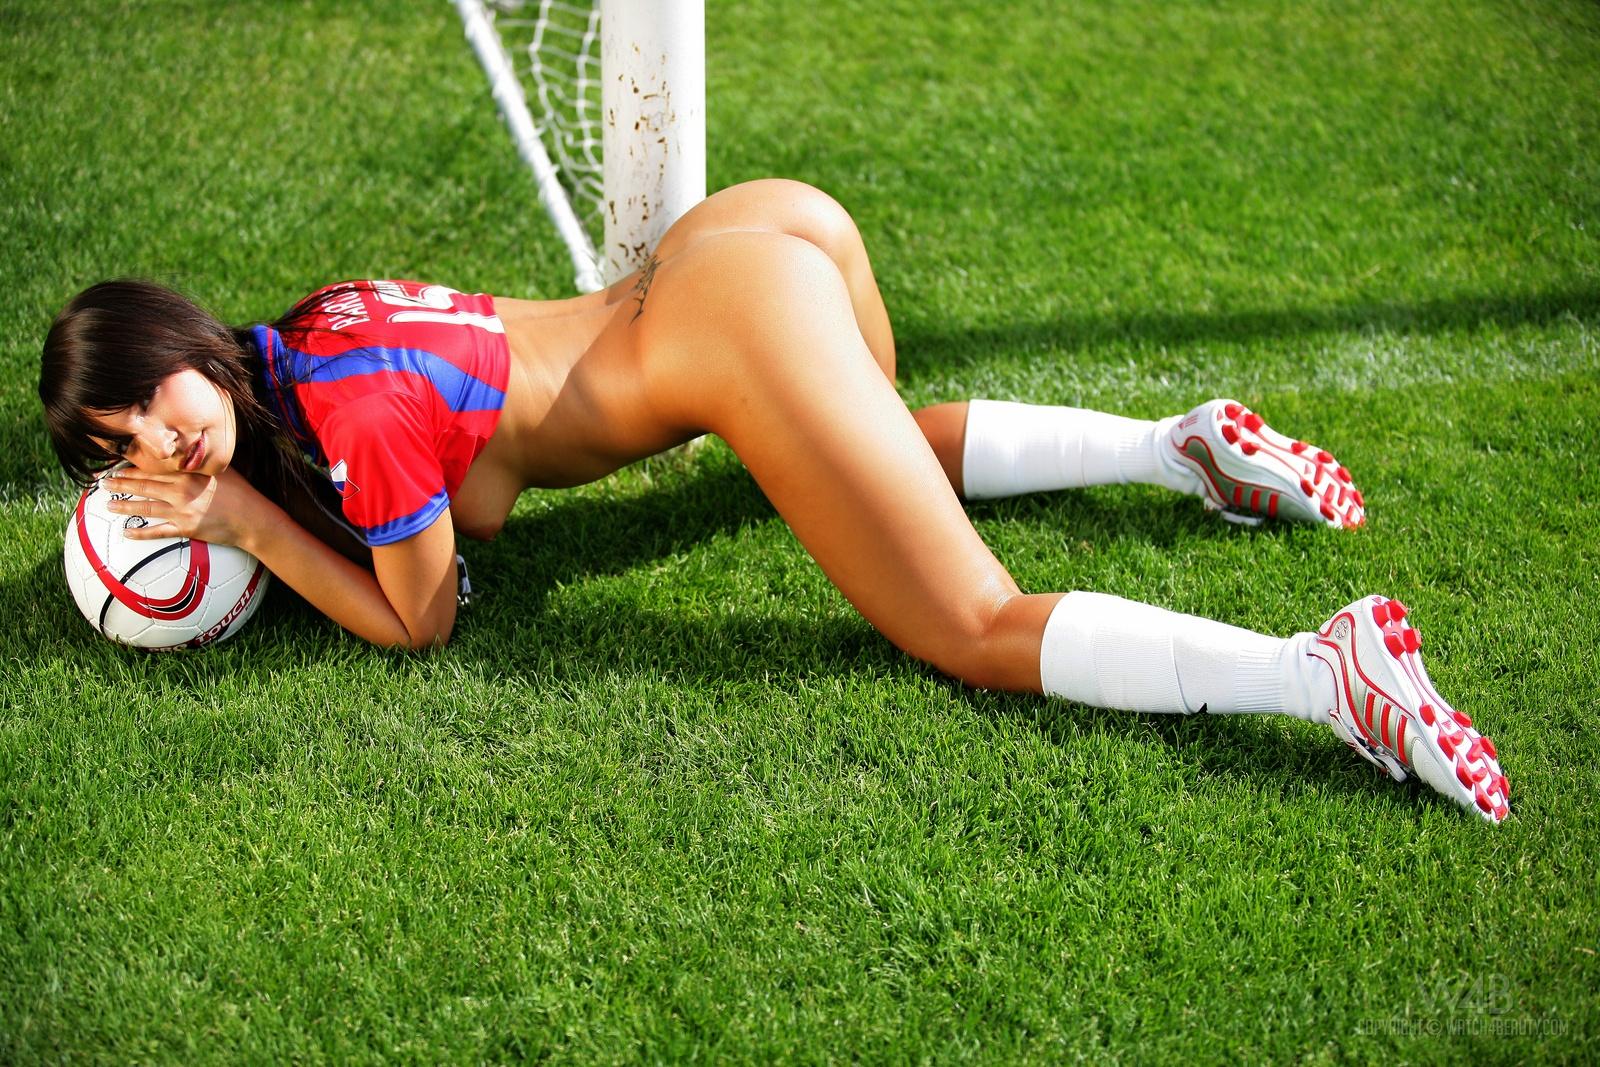 Nude women playing football